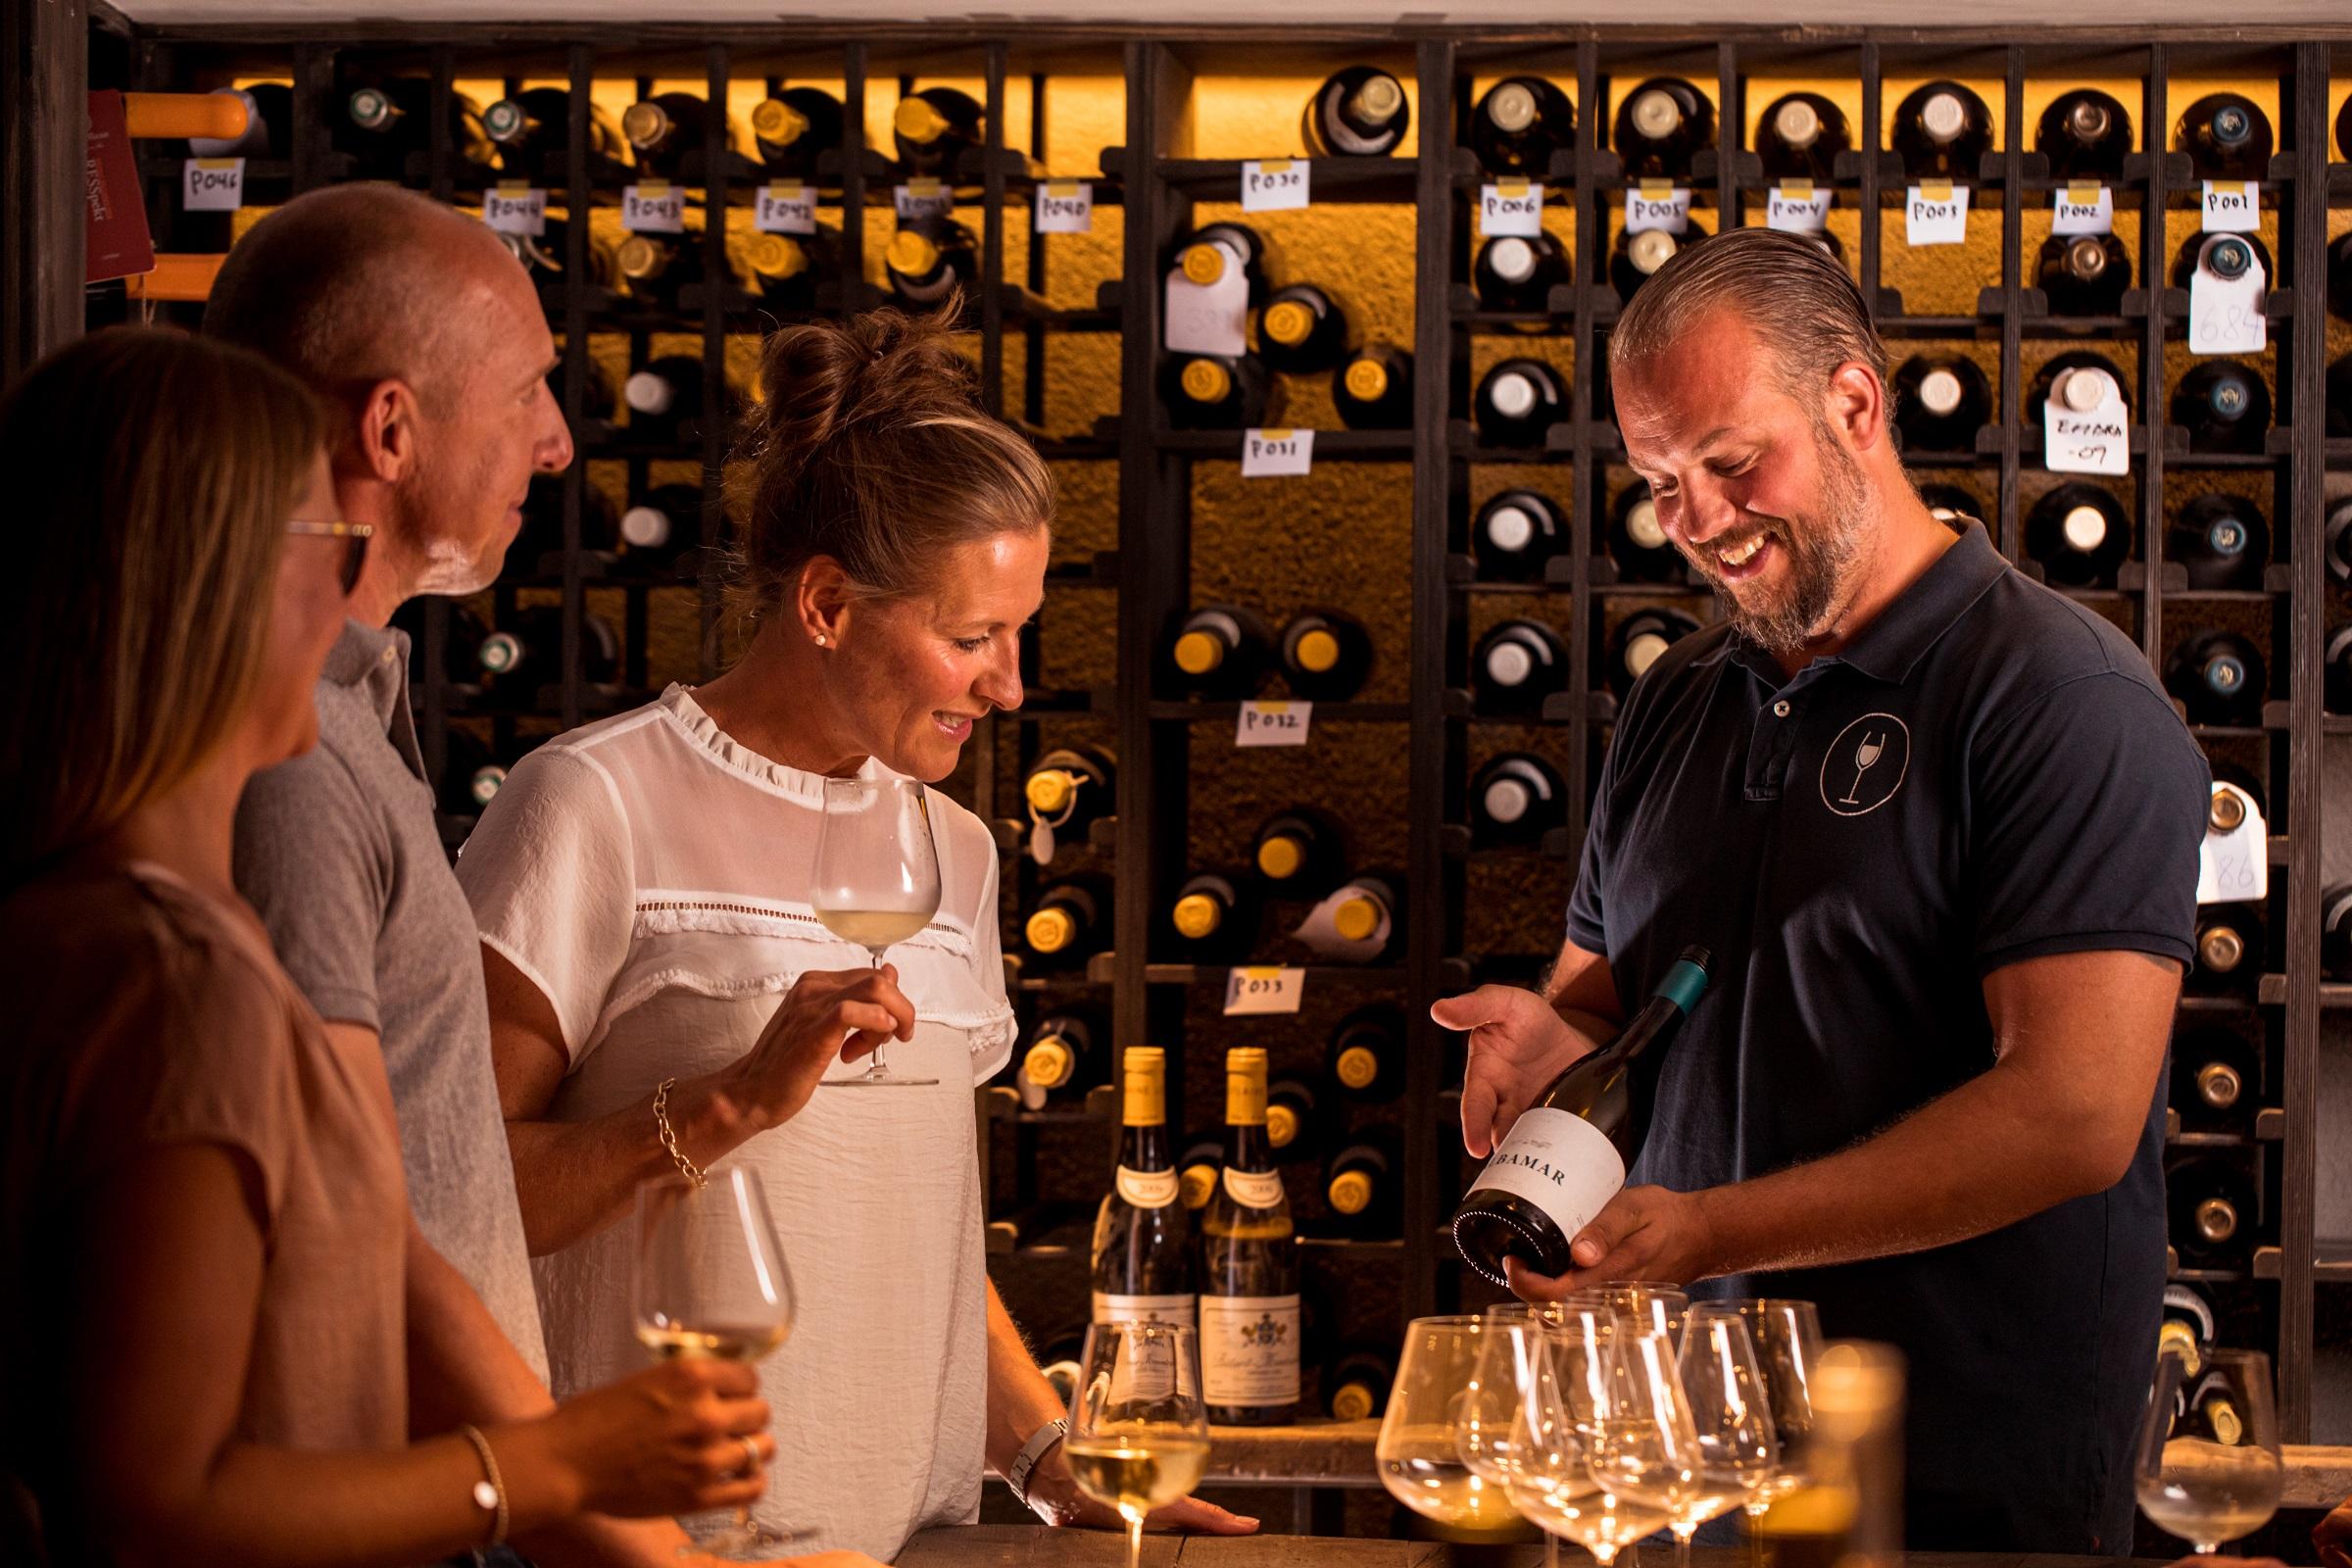 Man viser frem en flaske med vin til tre mennesker som følger interessert med